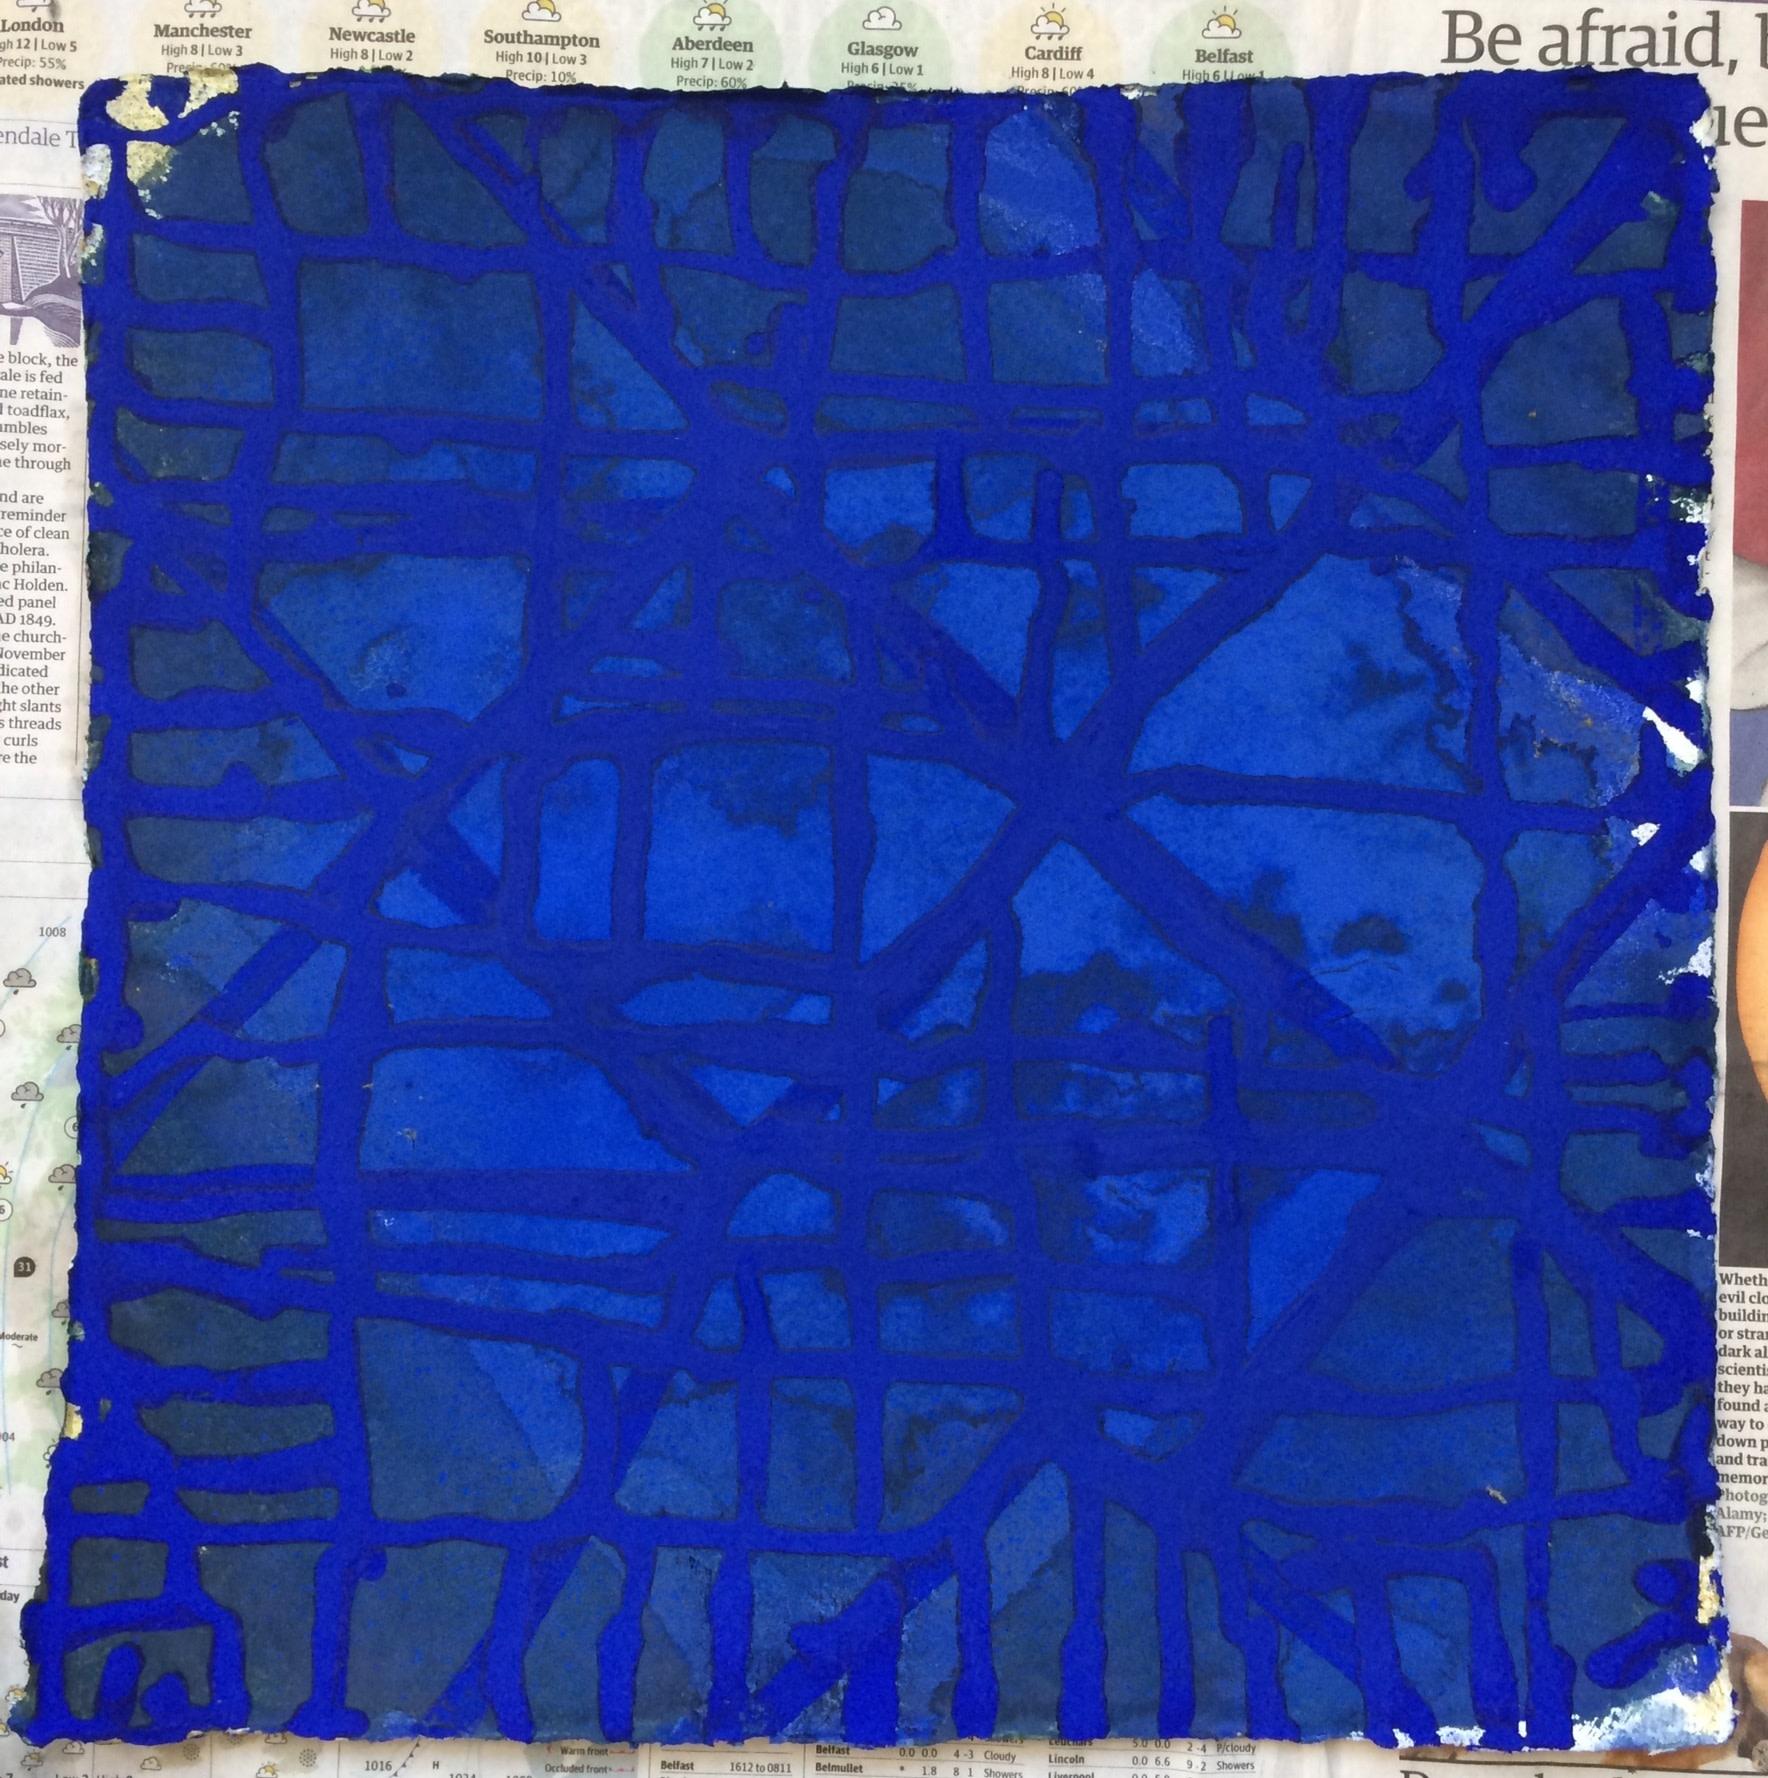 <span class=&#34;link fancybox-details-link&#34;><a href=&#34;/exhibitions/16/works/image_standalone381/&#34;>View Detail Page</a></span><p>Marion Jones,&#160;<em>Be Afraid</em>, &#163;350</p>